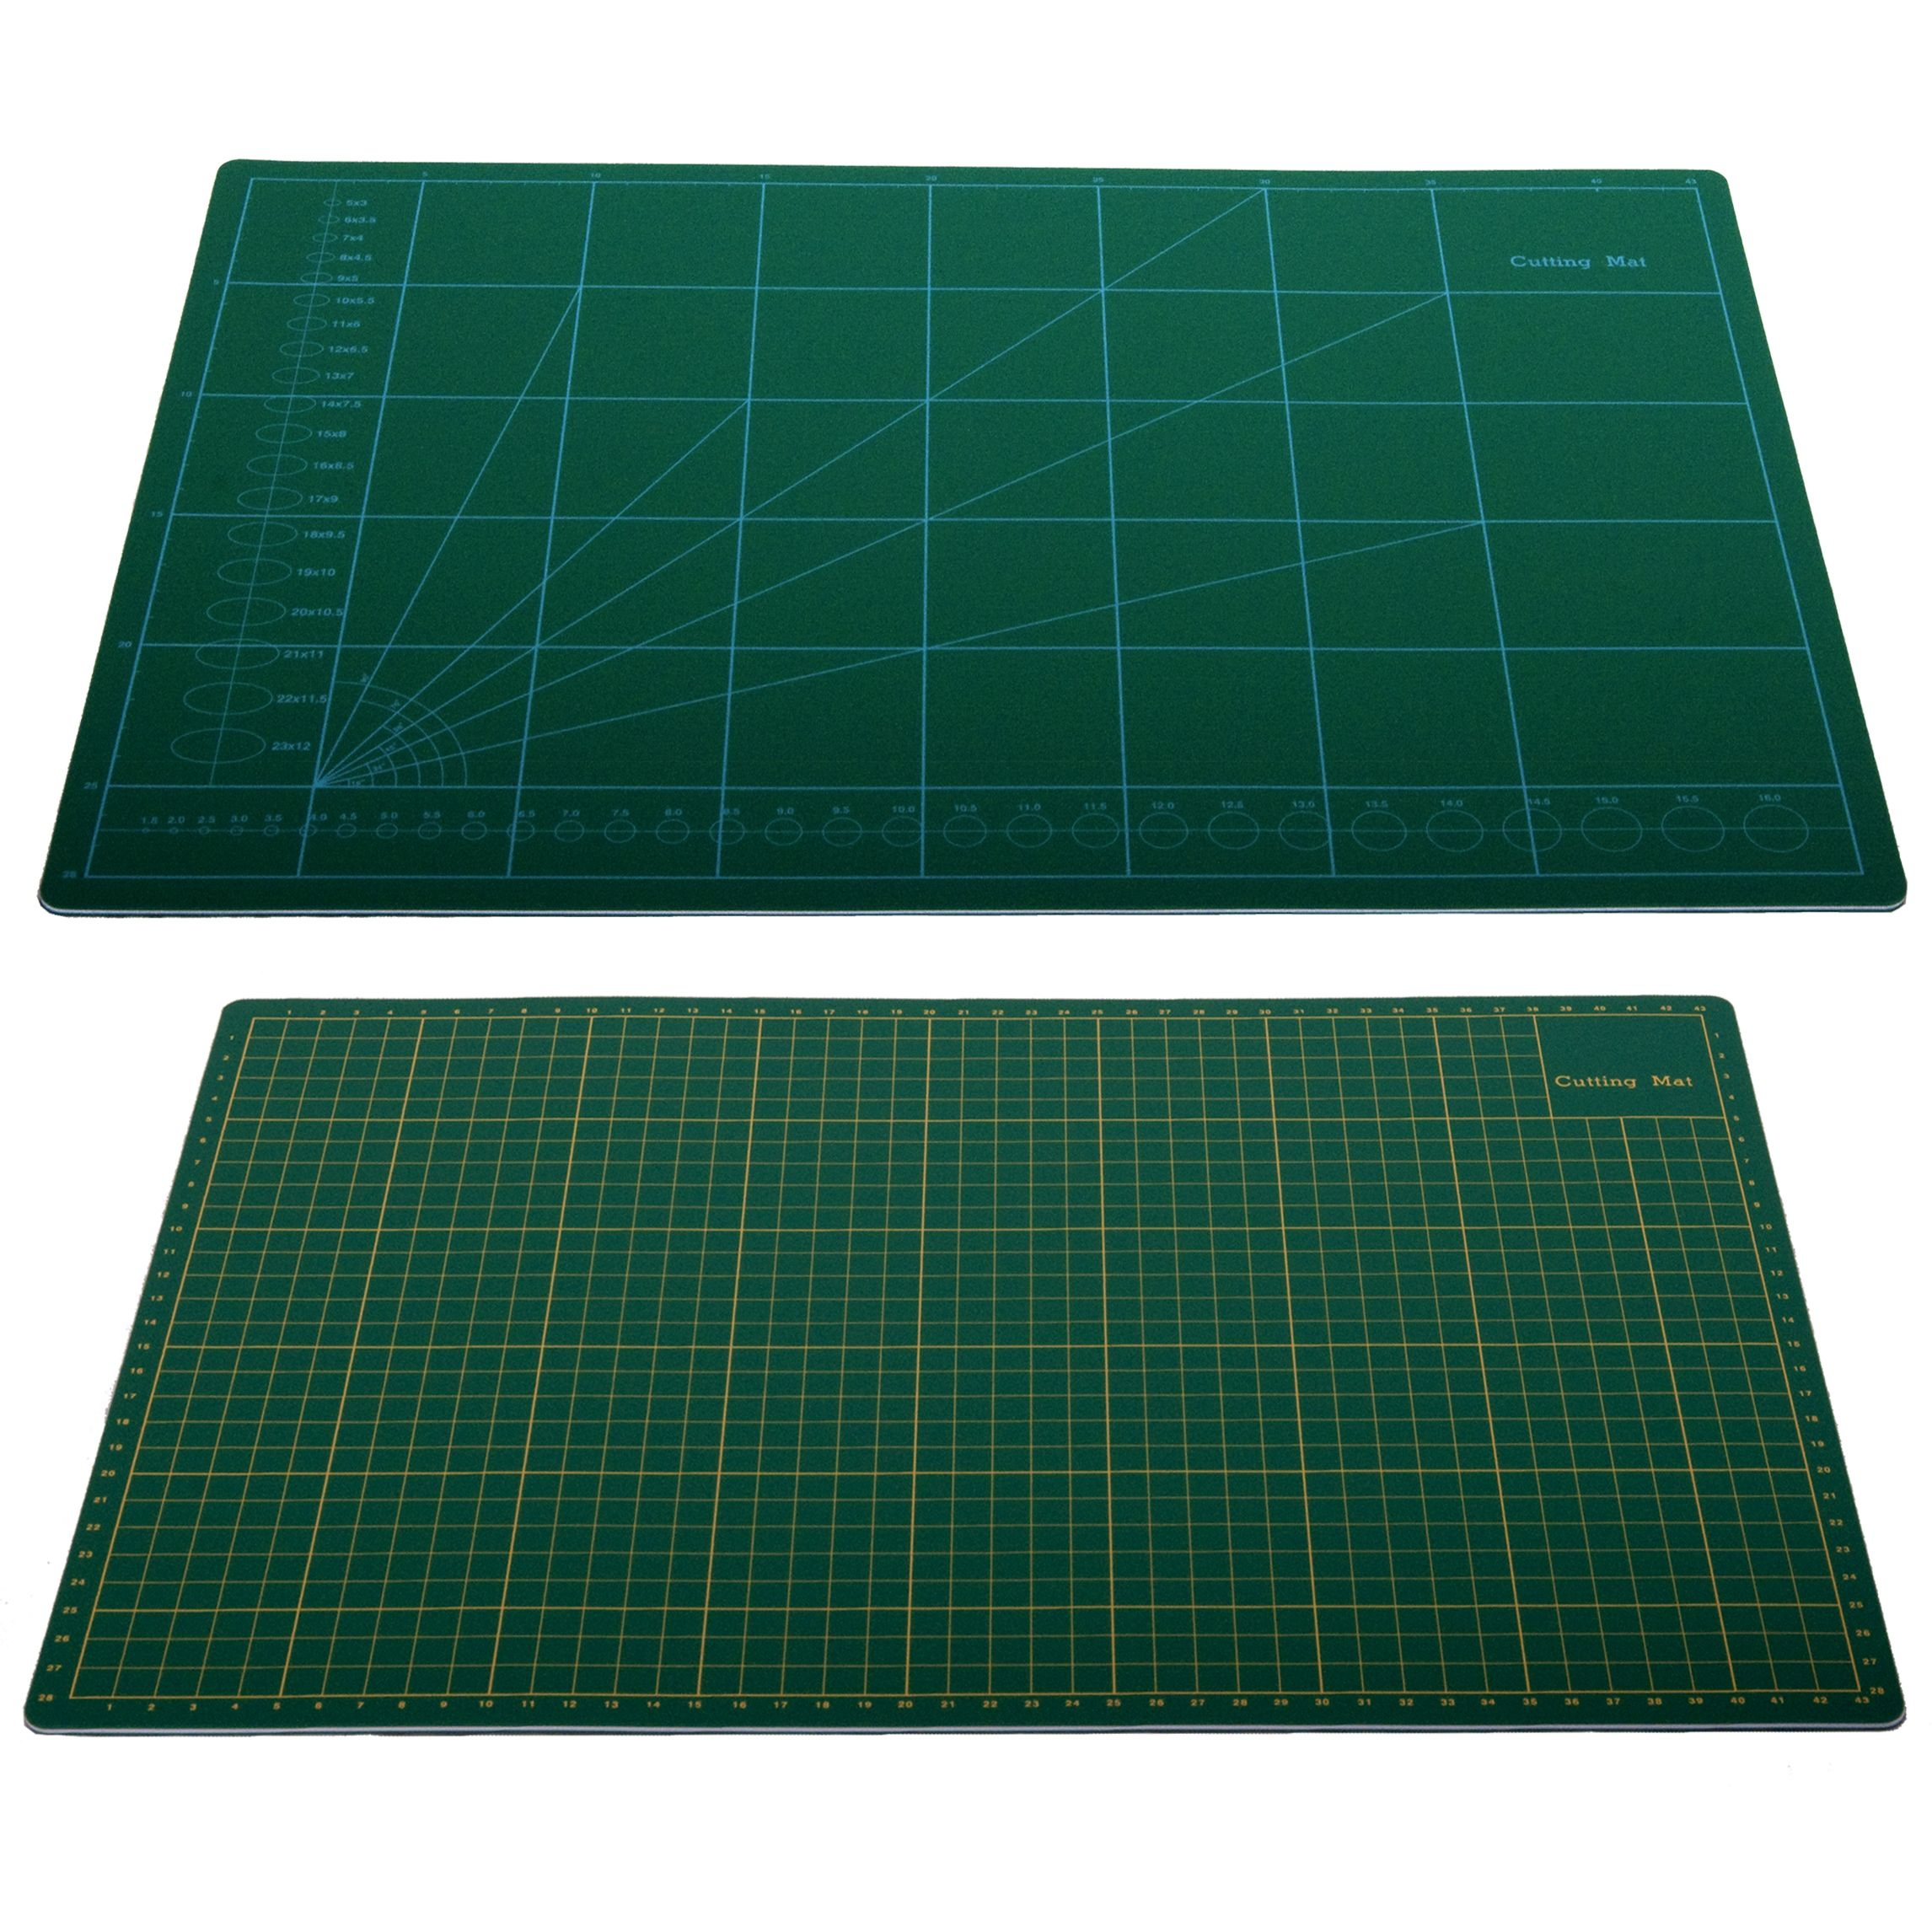 pk low olfarotarycuttersandmats prices mat at barnyarns rotary mats blades cutter cutters perforation olfa prc